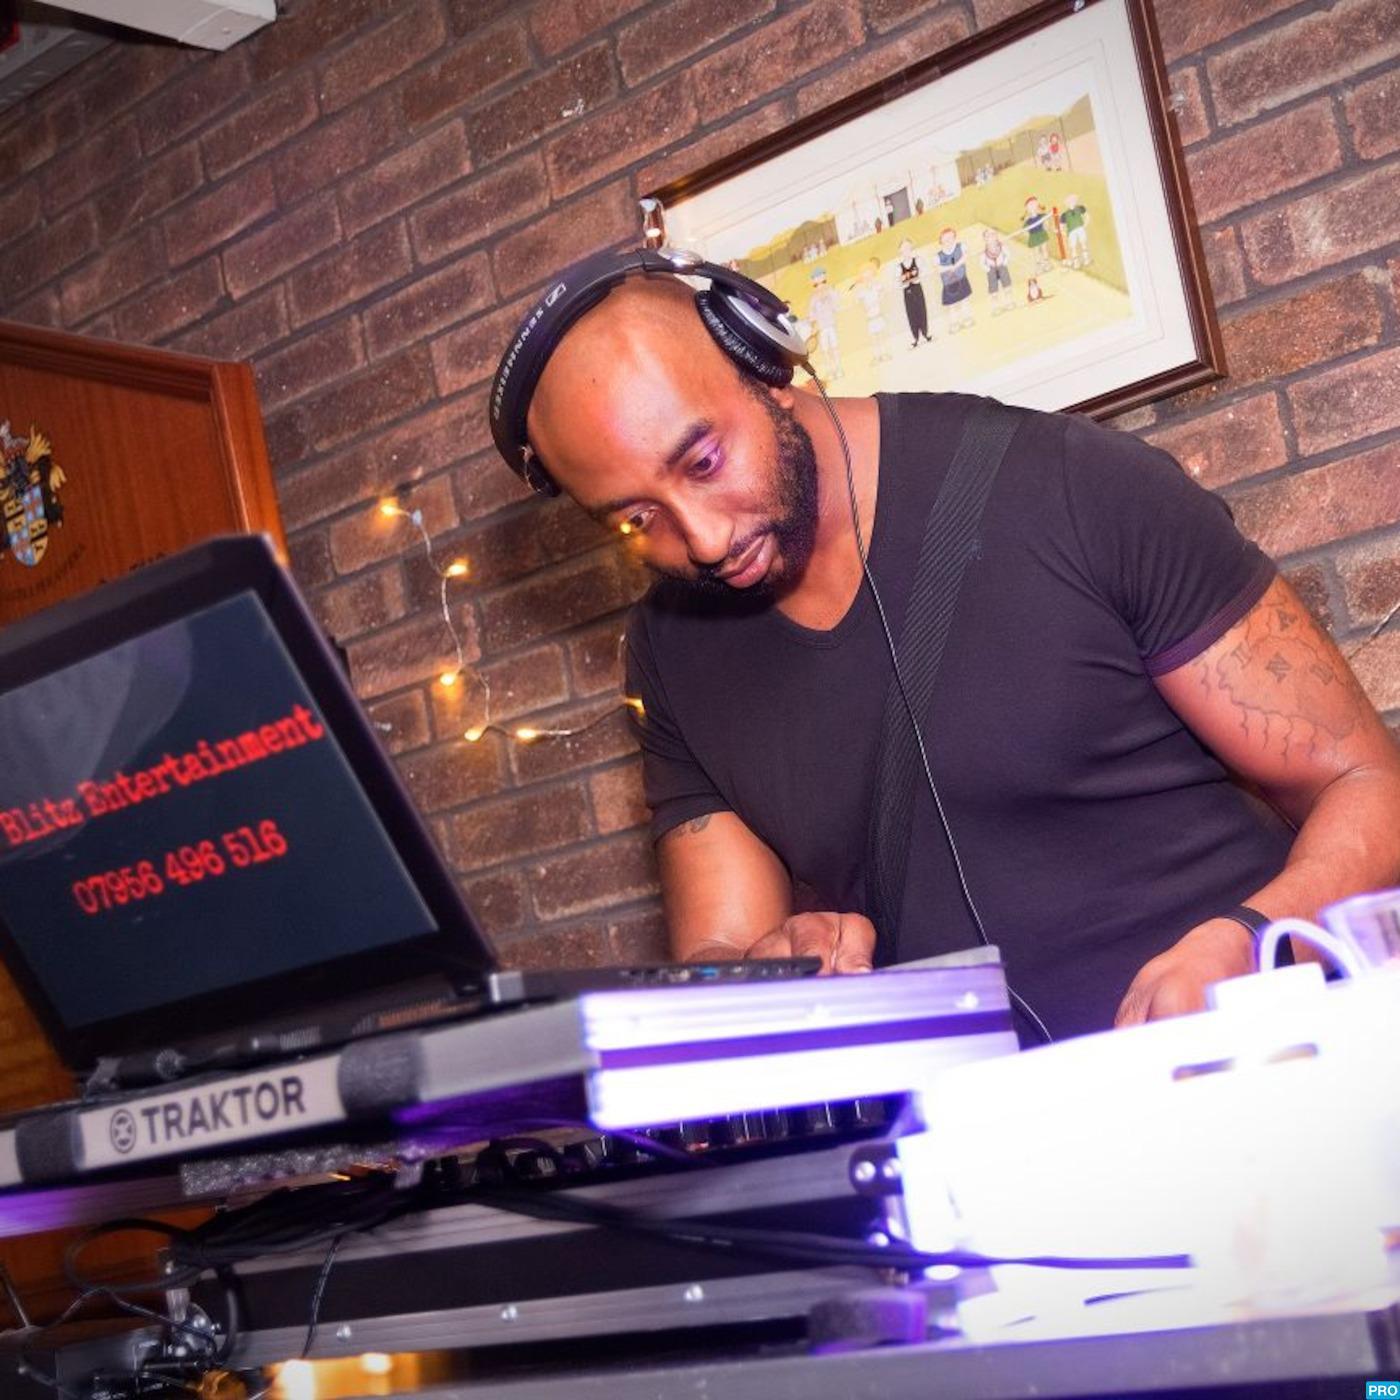 DJ Blitz in the mix - UK, R&B, Hip Hop, Dancehall, Reggae, Bashment